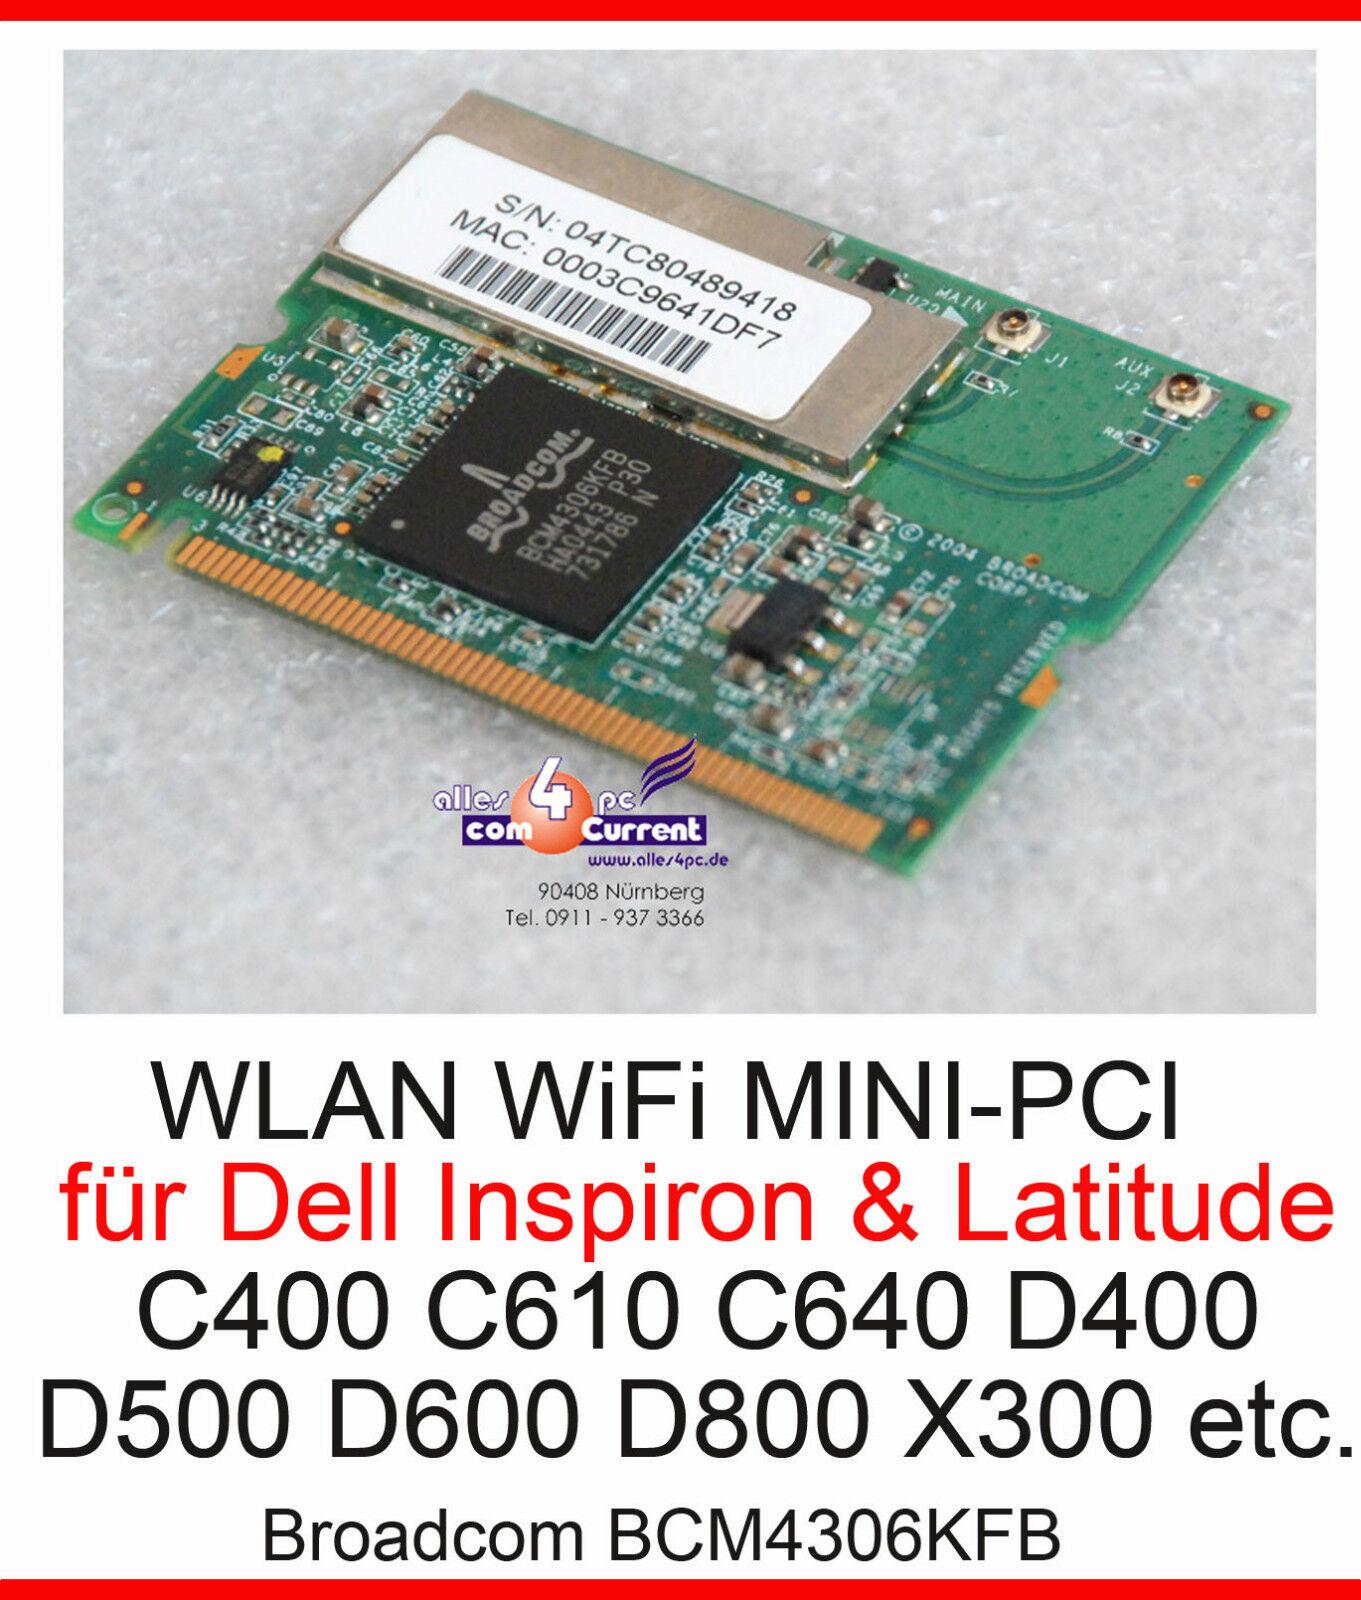 54 Mbit Mini PCI WLAN Network Card BCM4306KFB Wifi Dell Inspiron 300m 500M 5100